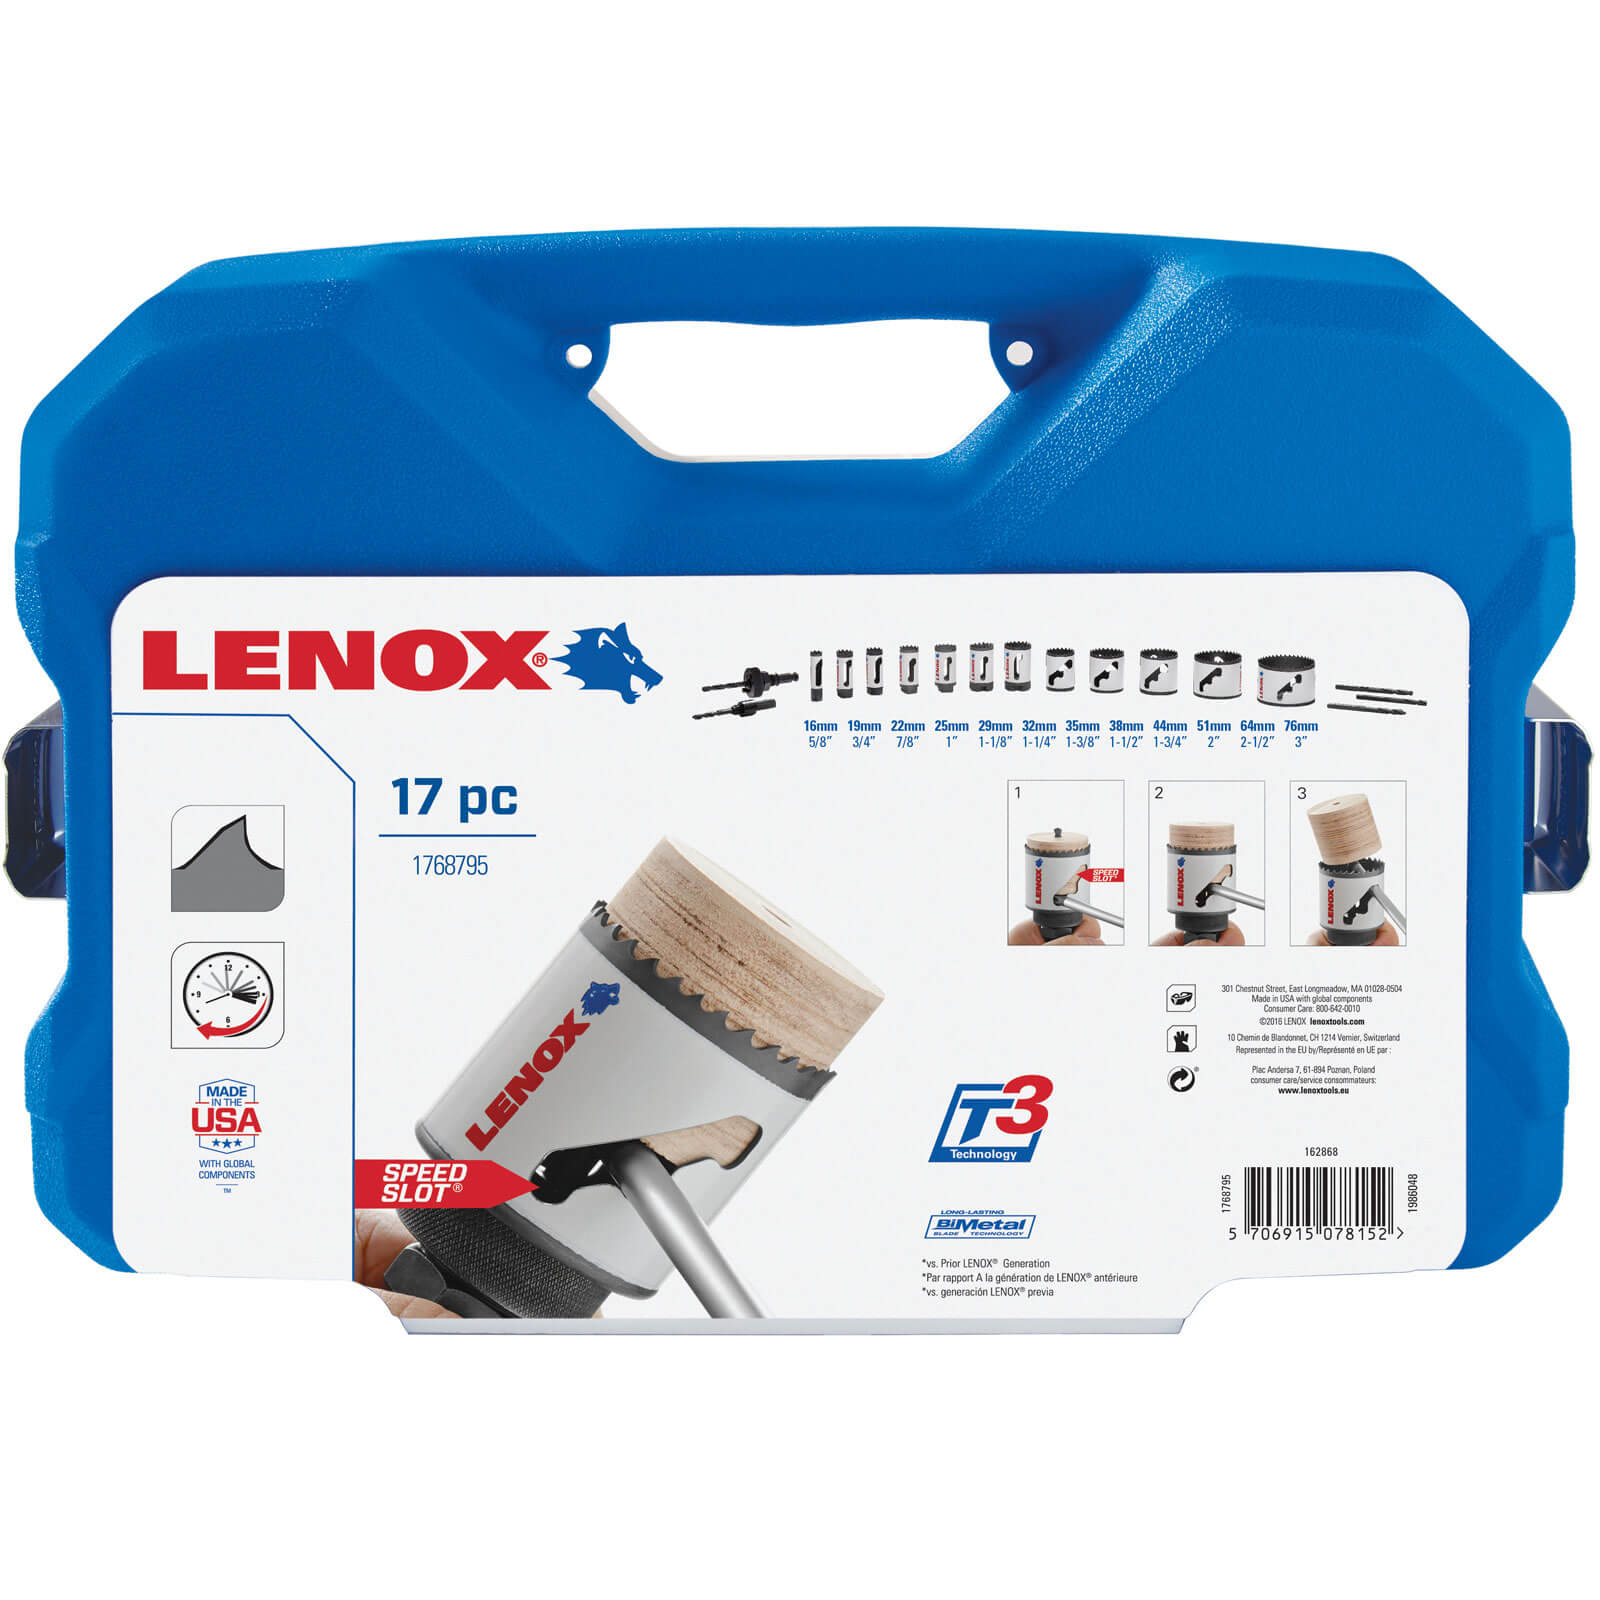 Image of Lenox 17 Piece Contractors Hole Saw Set